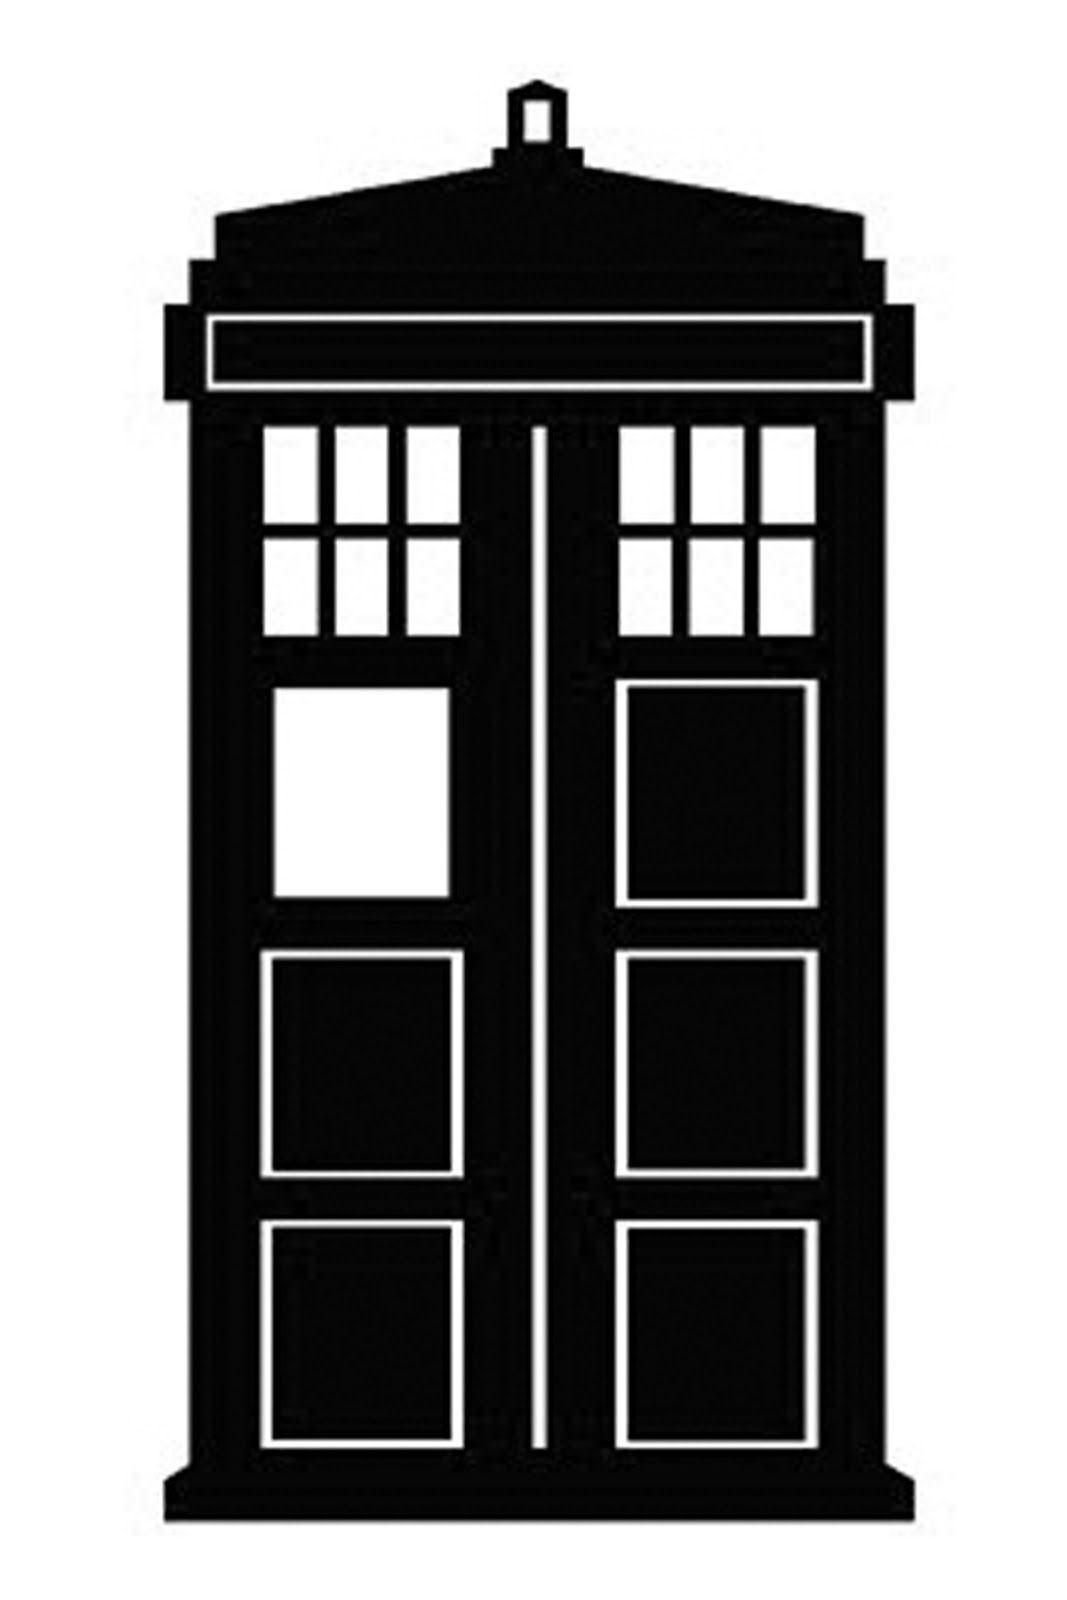 Tardis Dr Who Vinyl Decal  Email Me At Customizeddecalsgmailcom - Custom vinyl stickers no minimum